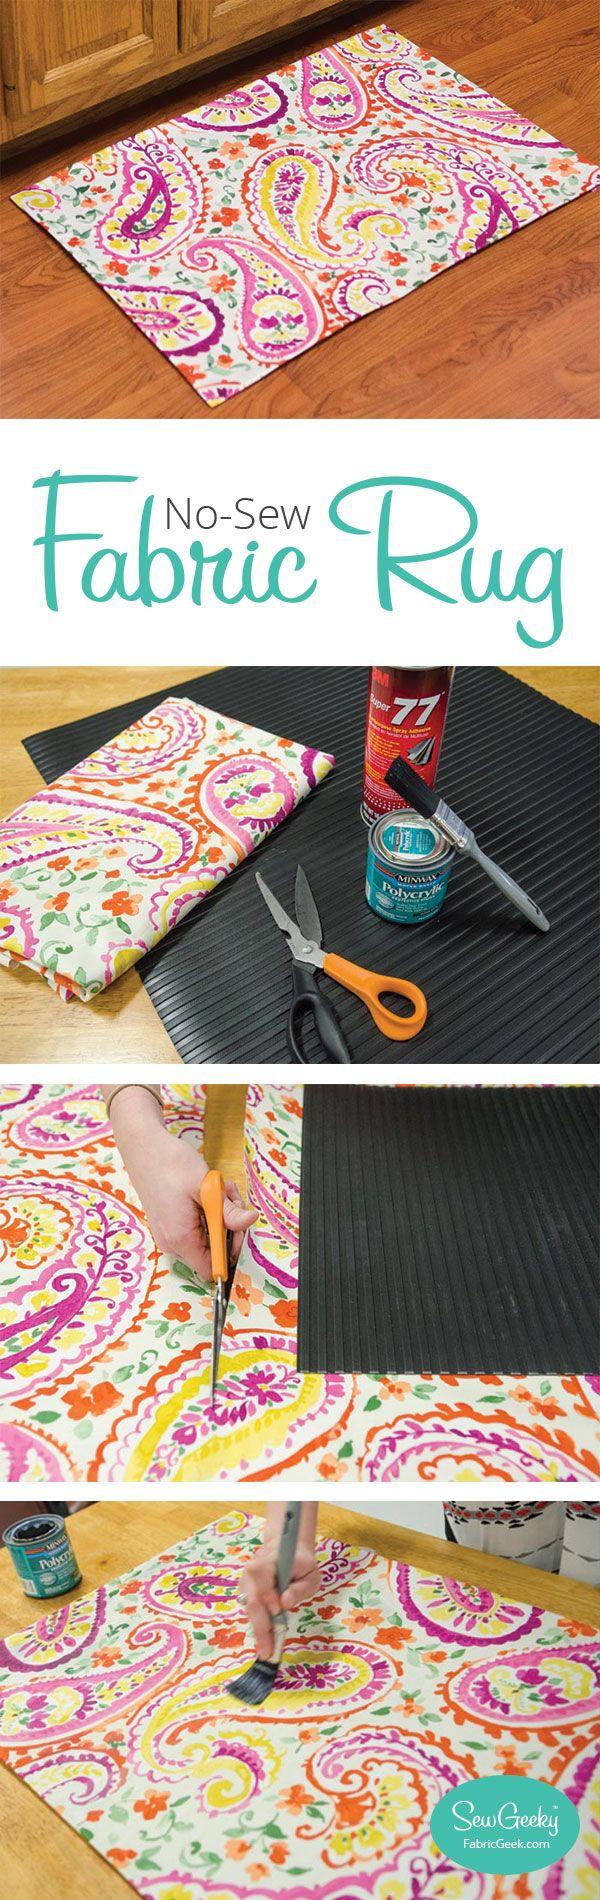 Make A No Sew Fabric Rug Sew Geeky Meet The Fun Side Of Fabric Fabric Rug Diy Fabric Diy Rug